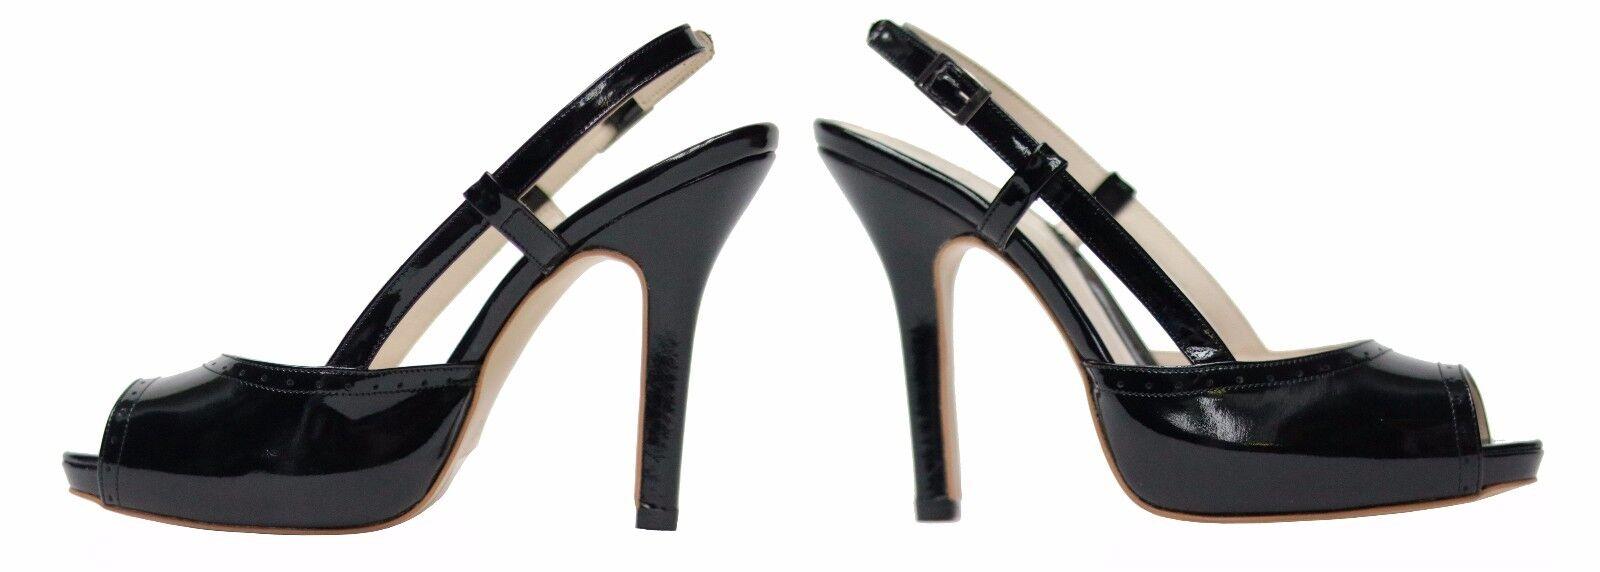 Damen Lack Schuhe Pumps Gr.37 Schwarz